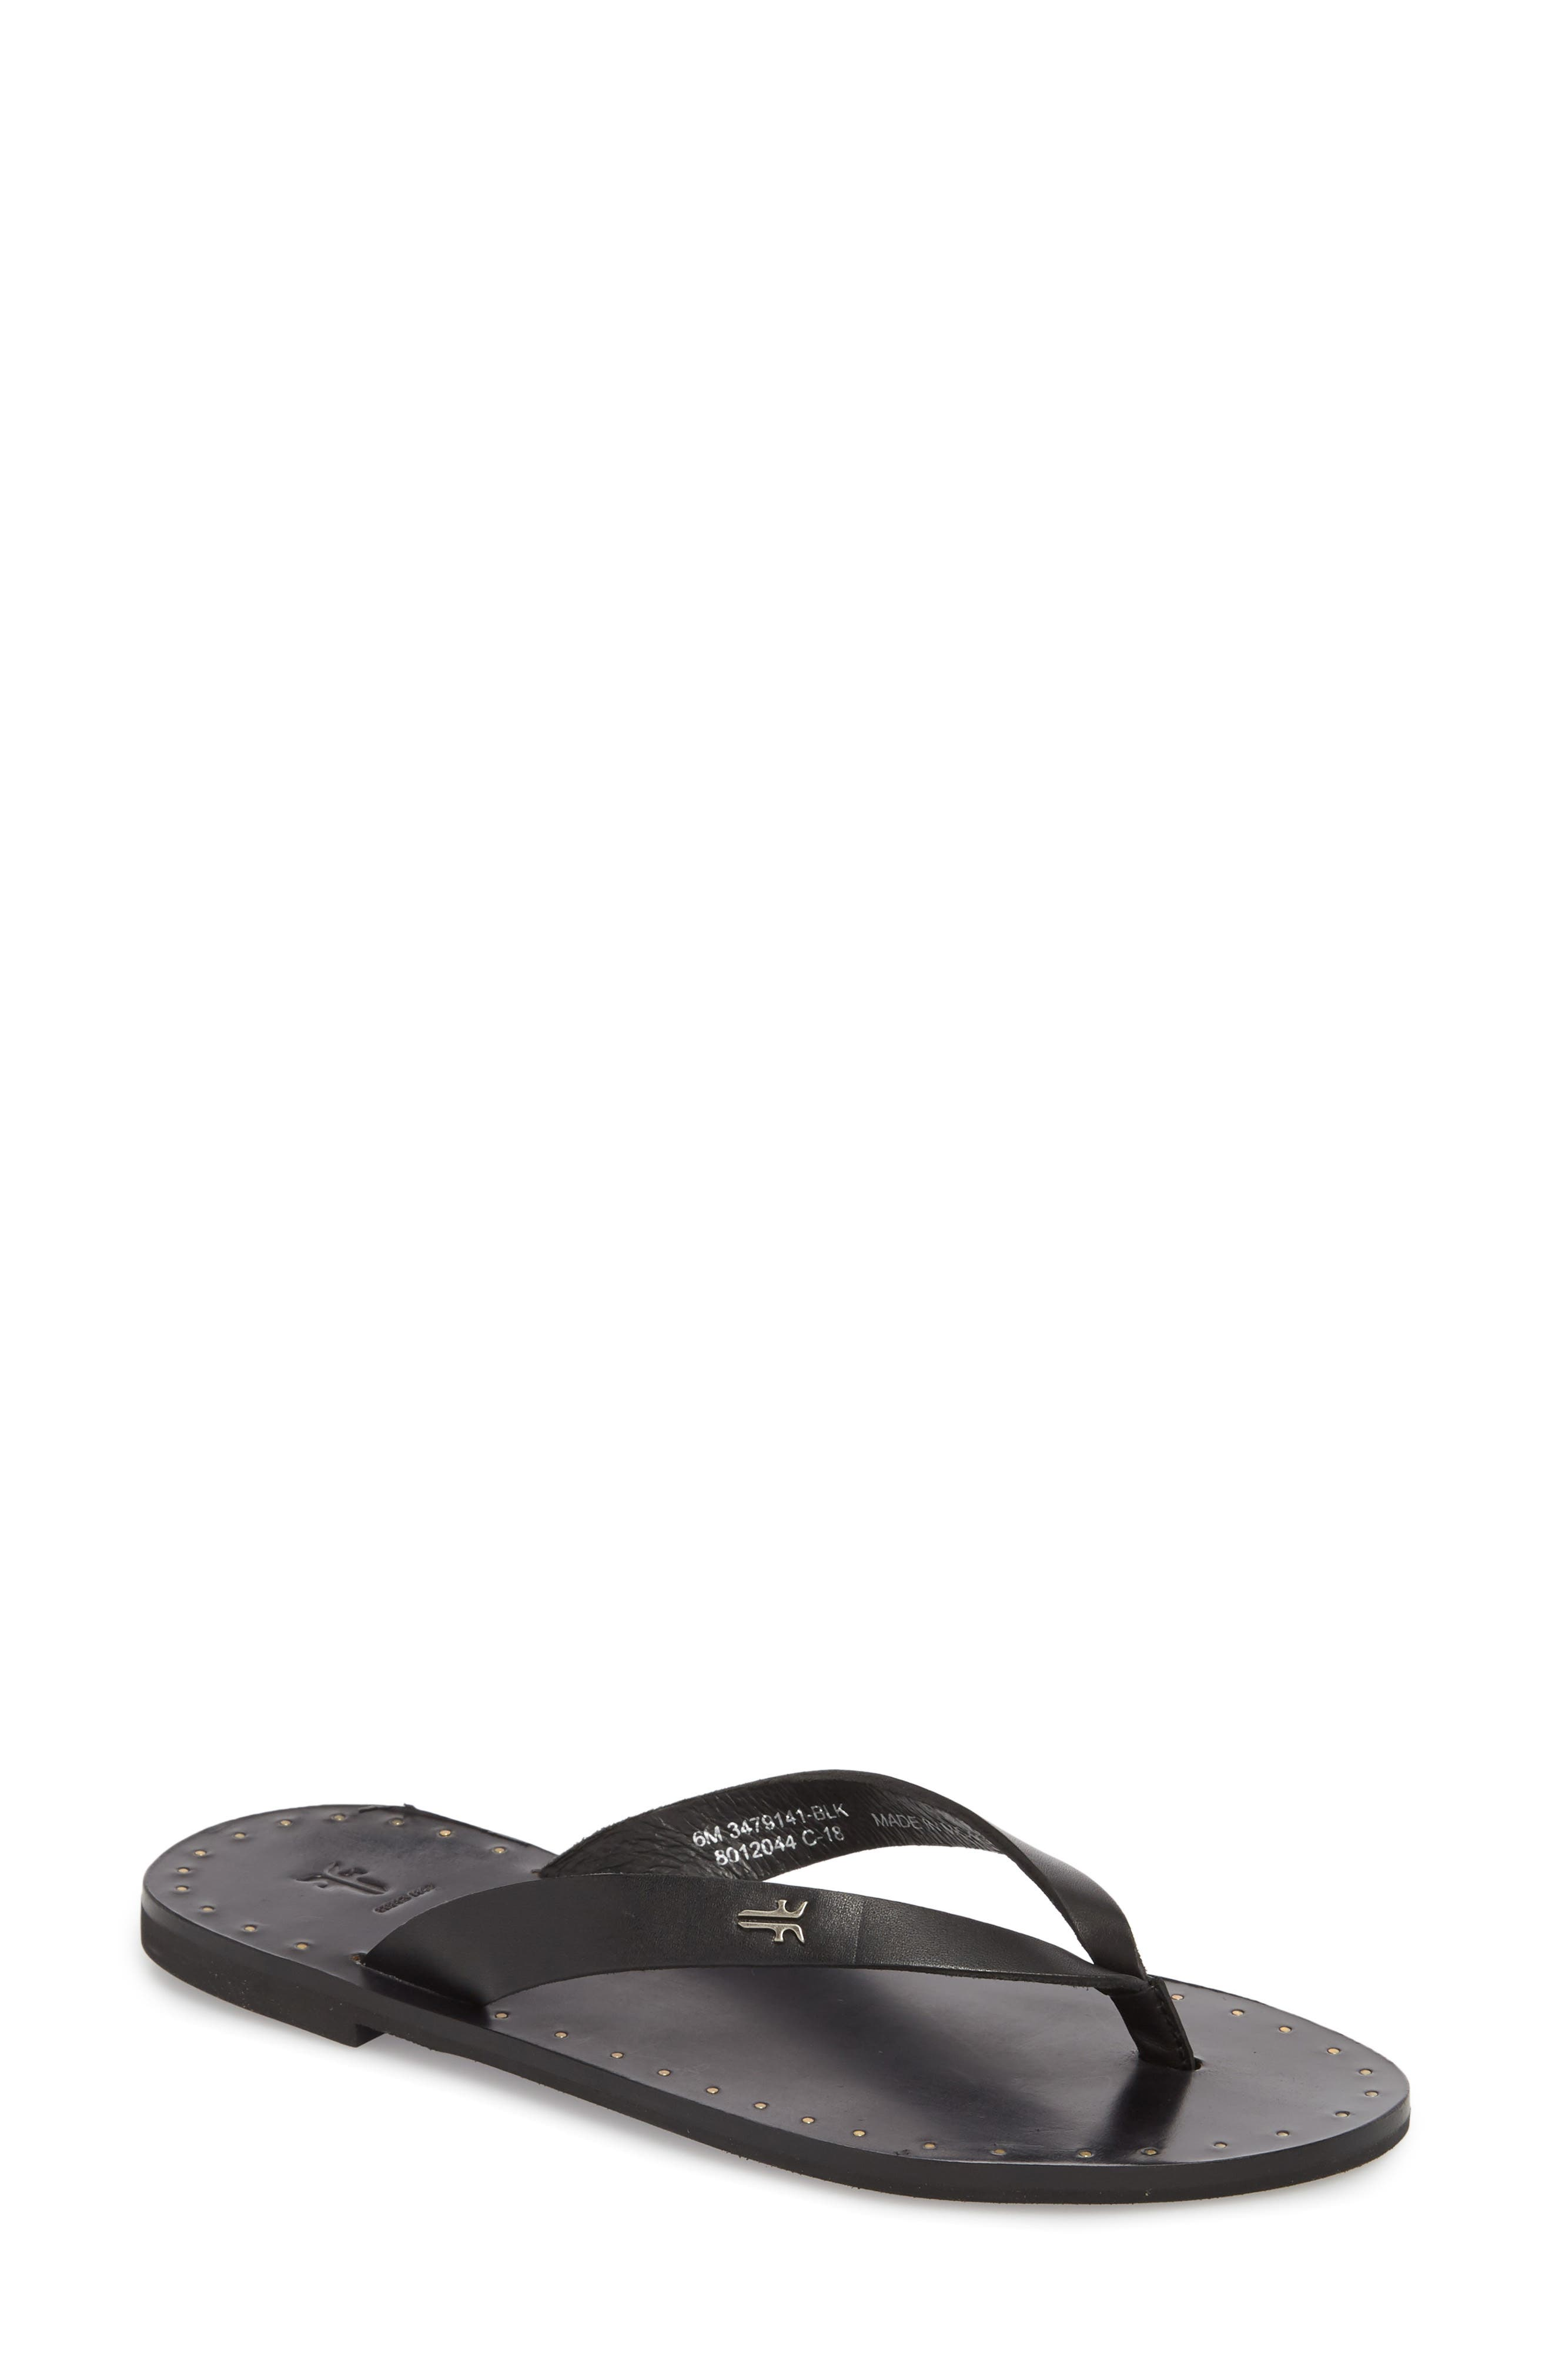 Ally Flip Flop,                             Main thumbnail 1, color,                             Black Leather